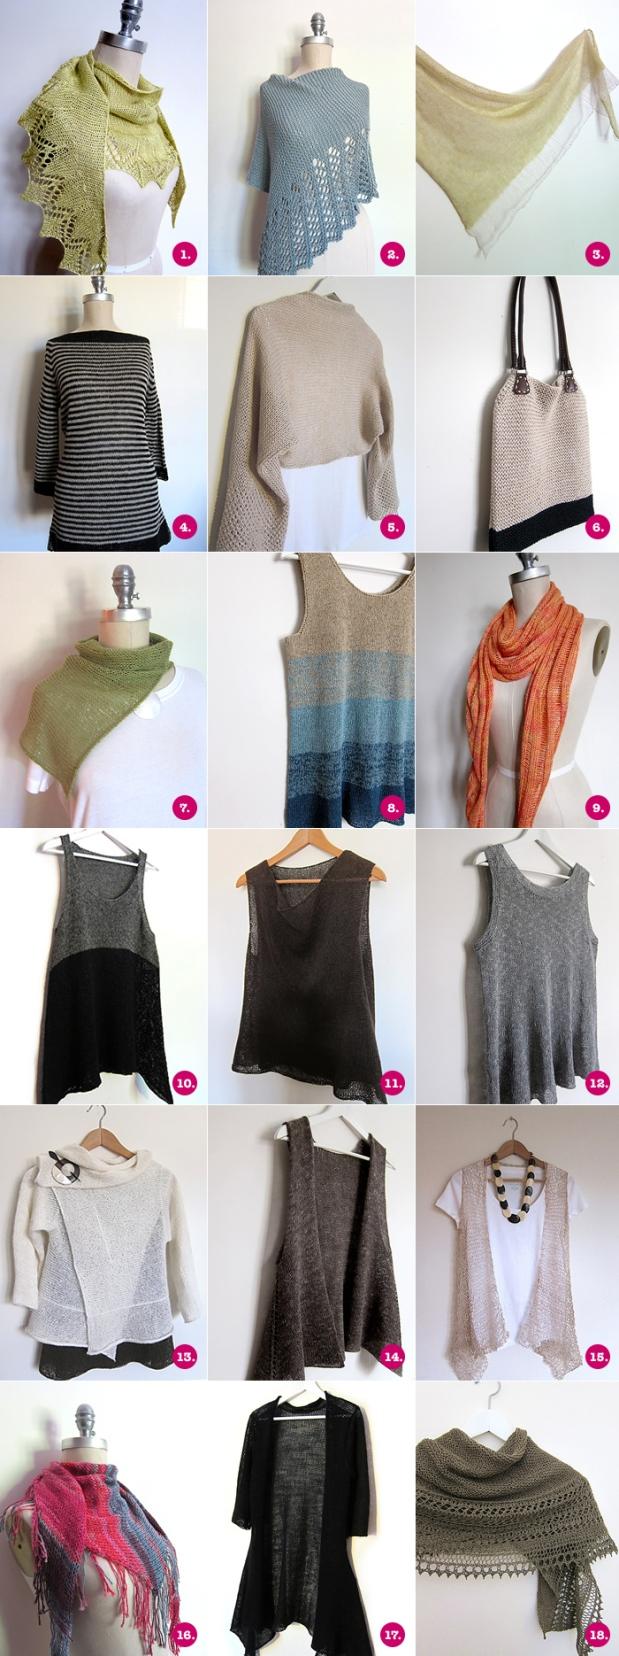 summer_store_sample_roundup